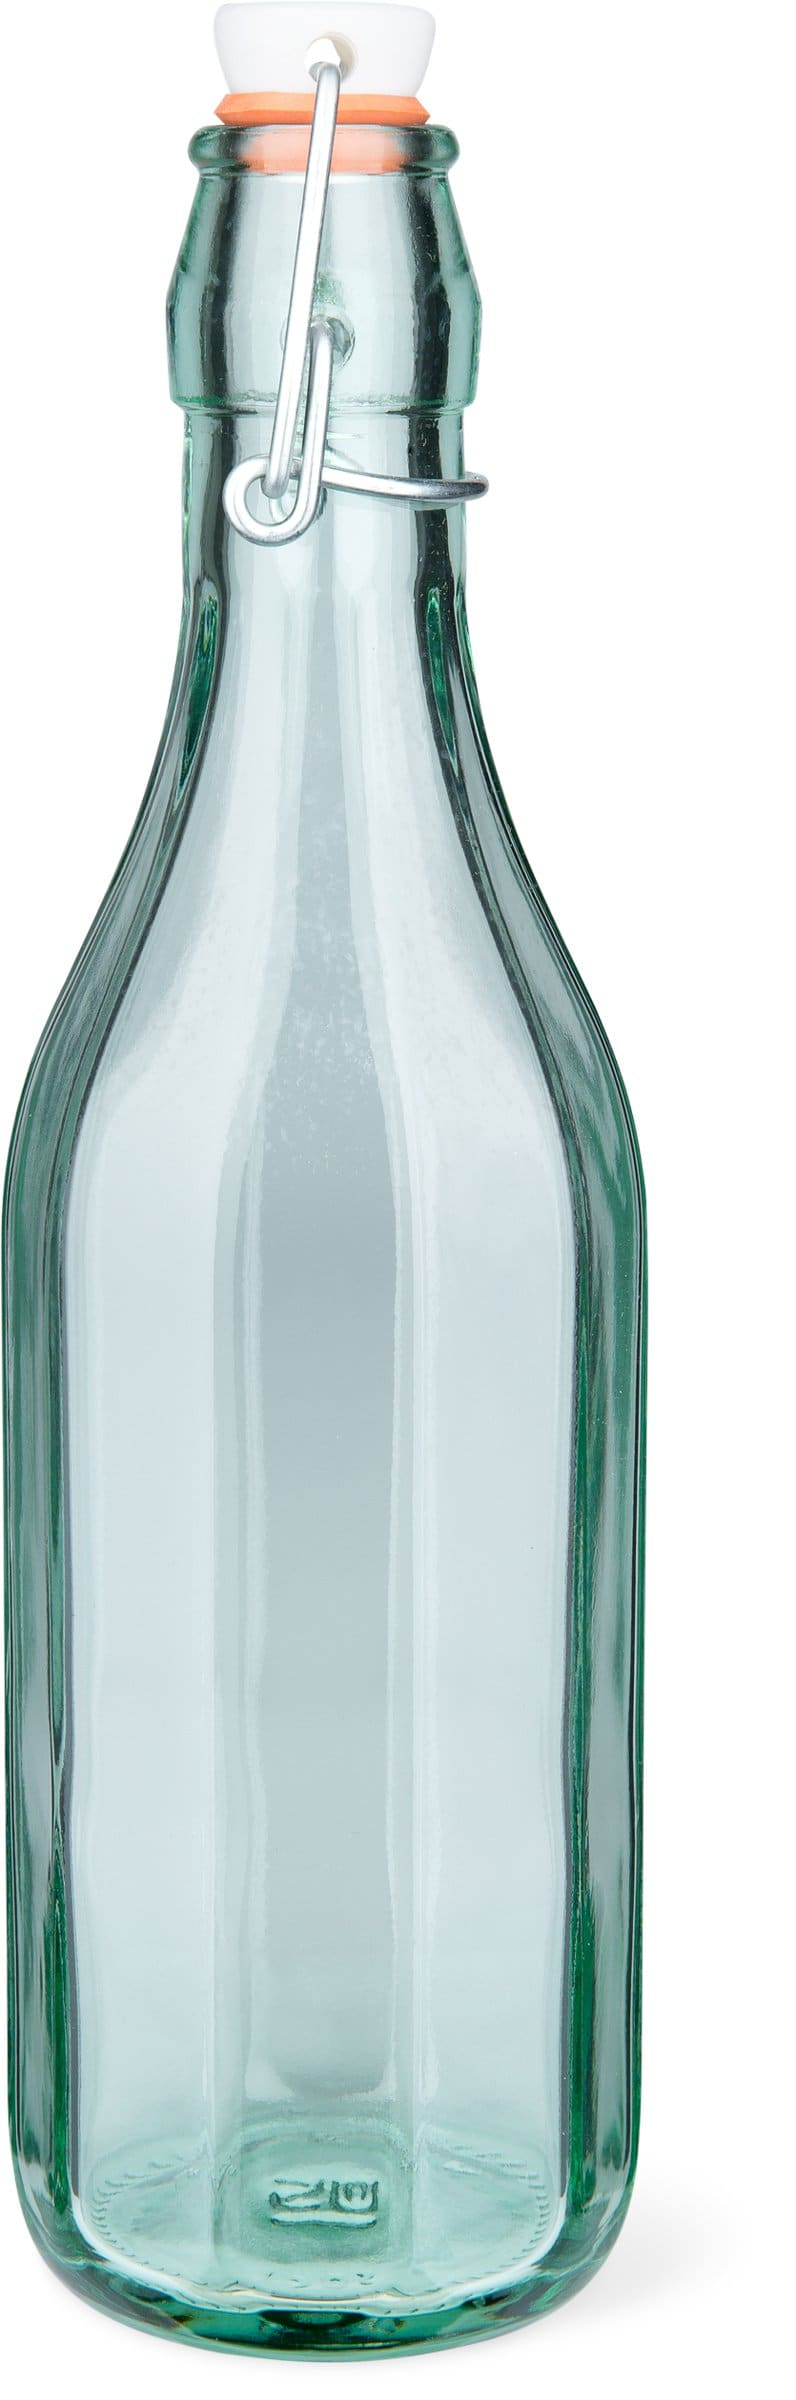 Flasche CUCINA&TAVOLA